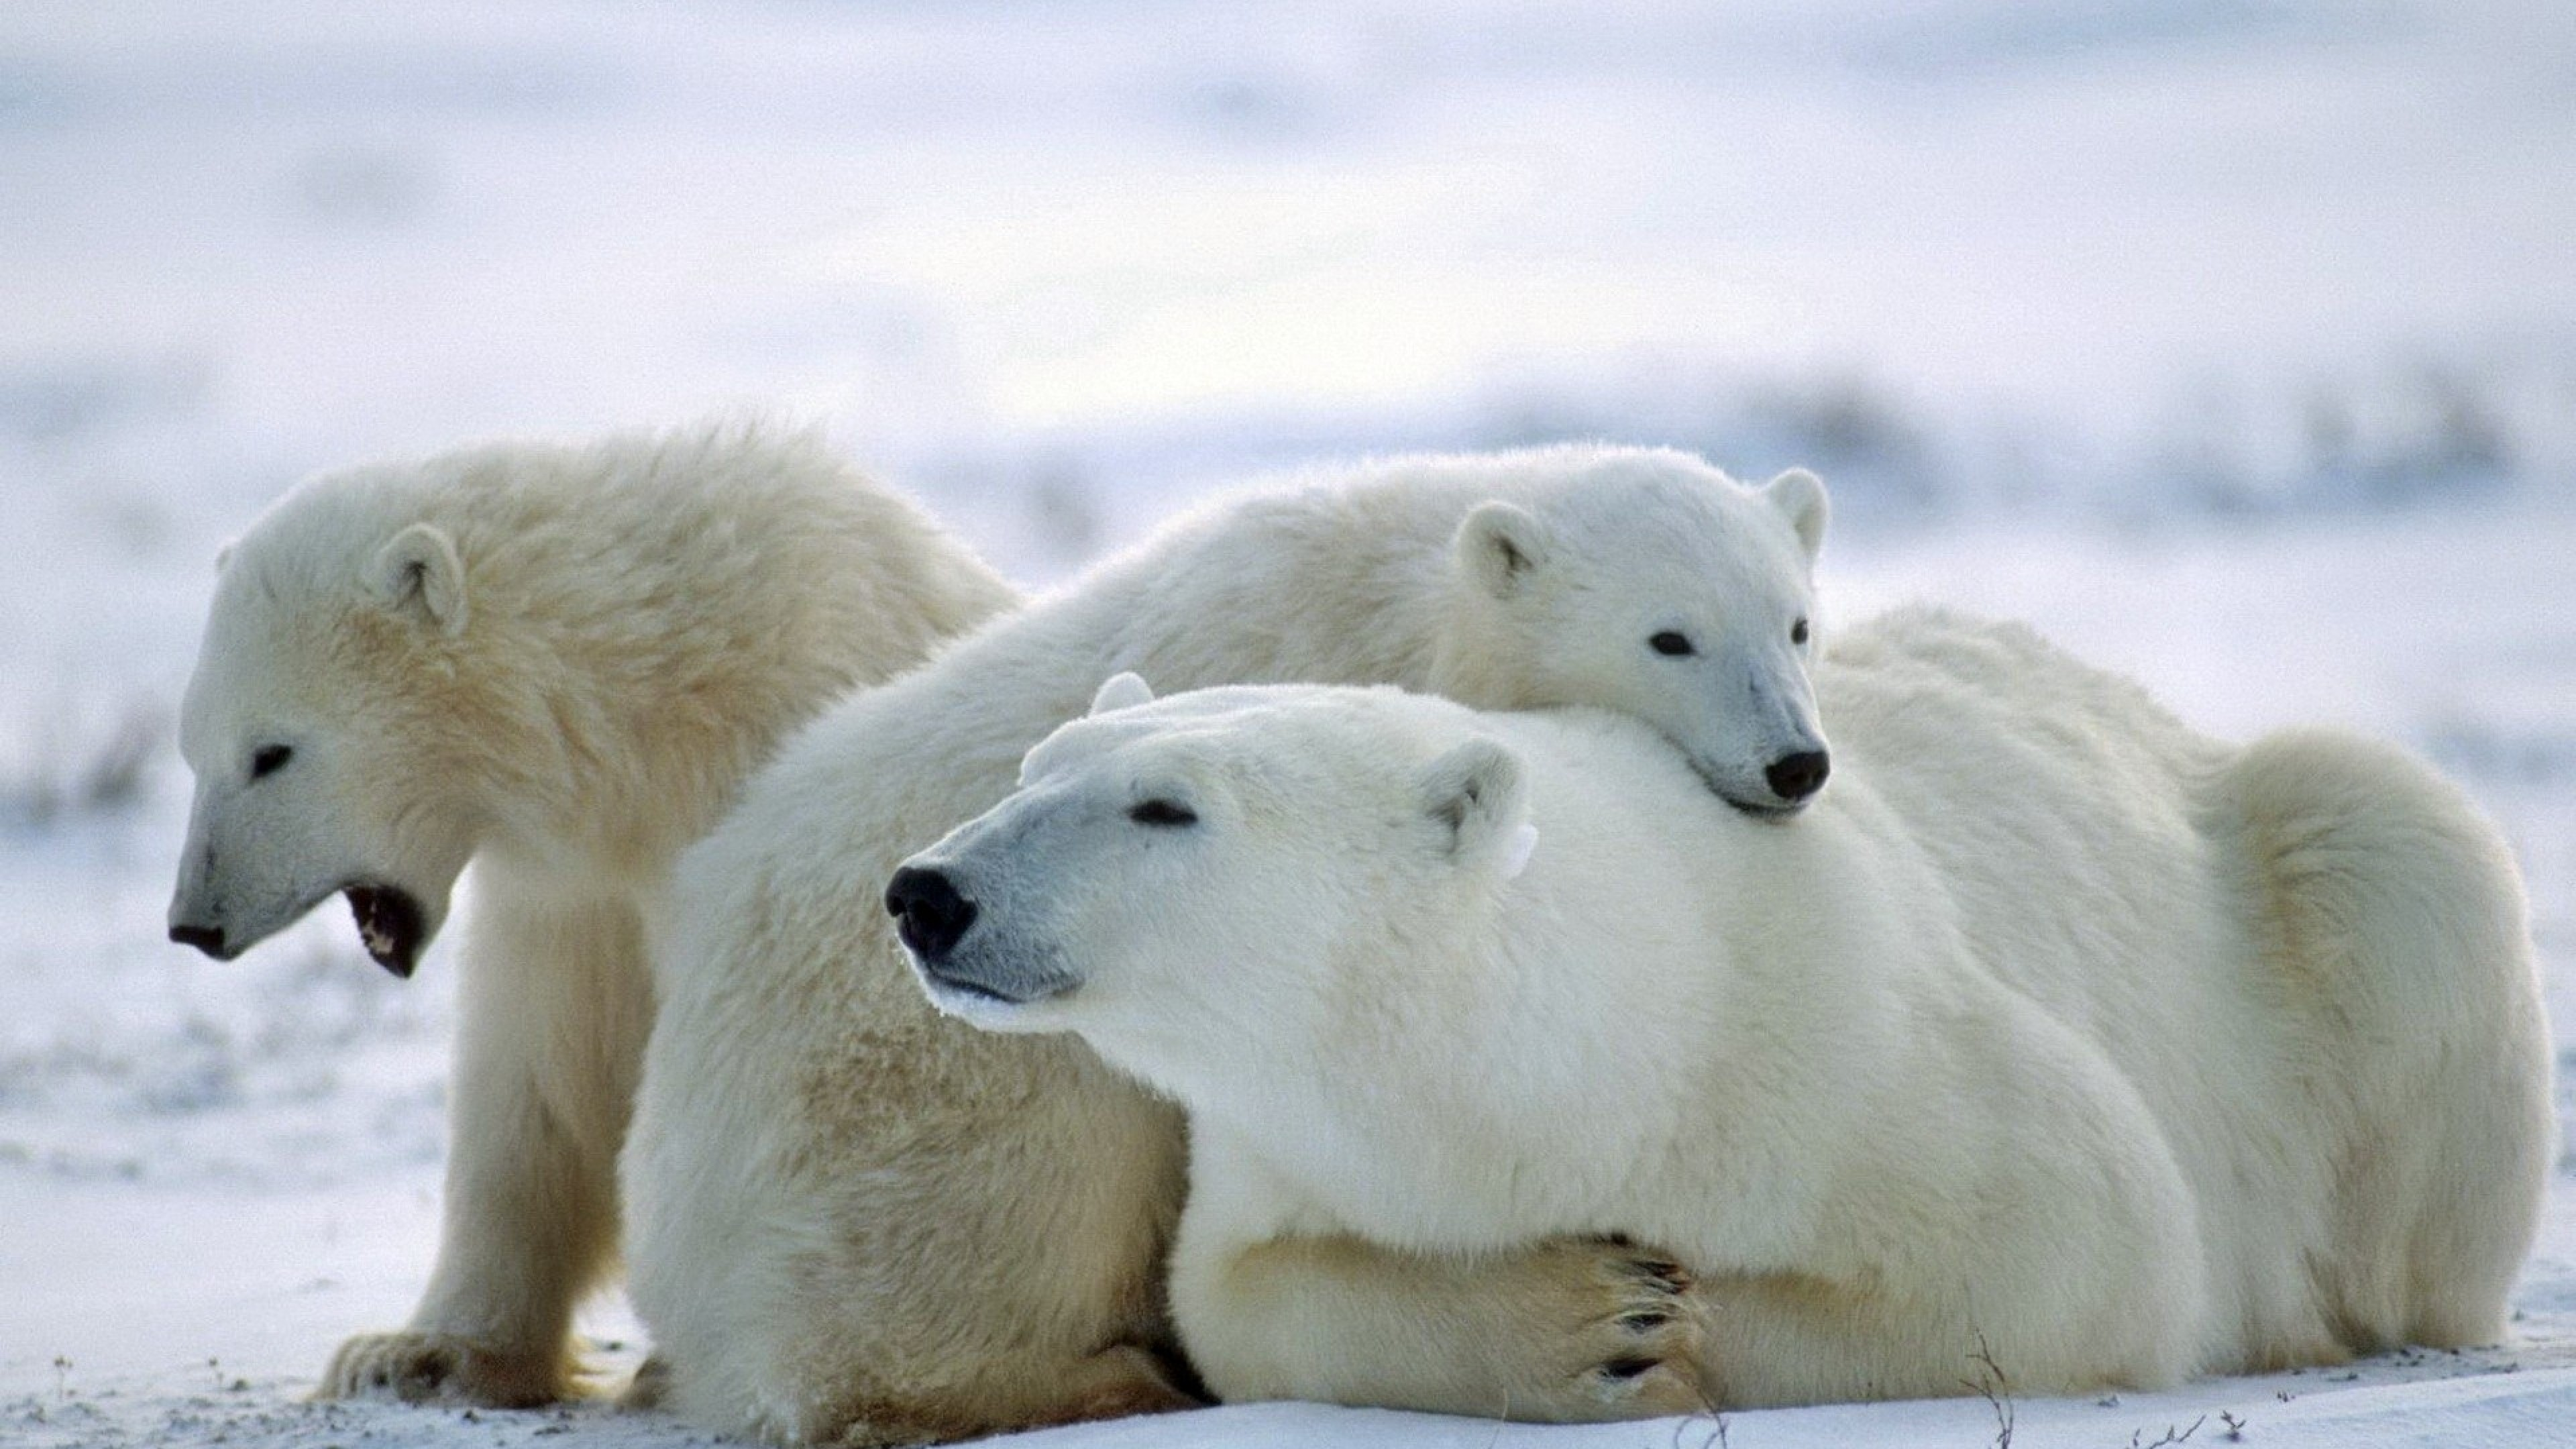 Wallpaper bear, polar bear, family, care, snow